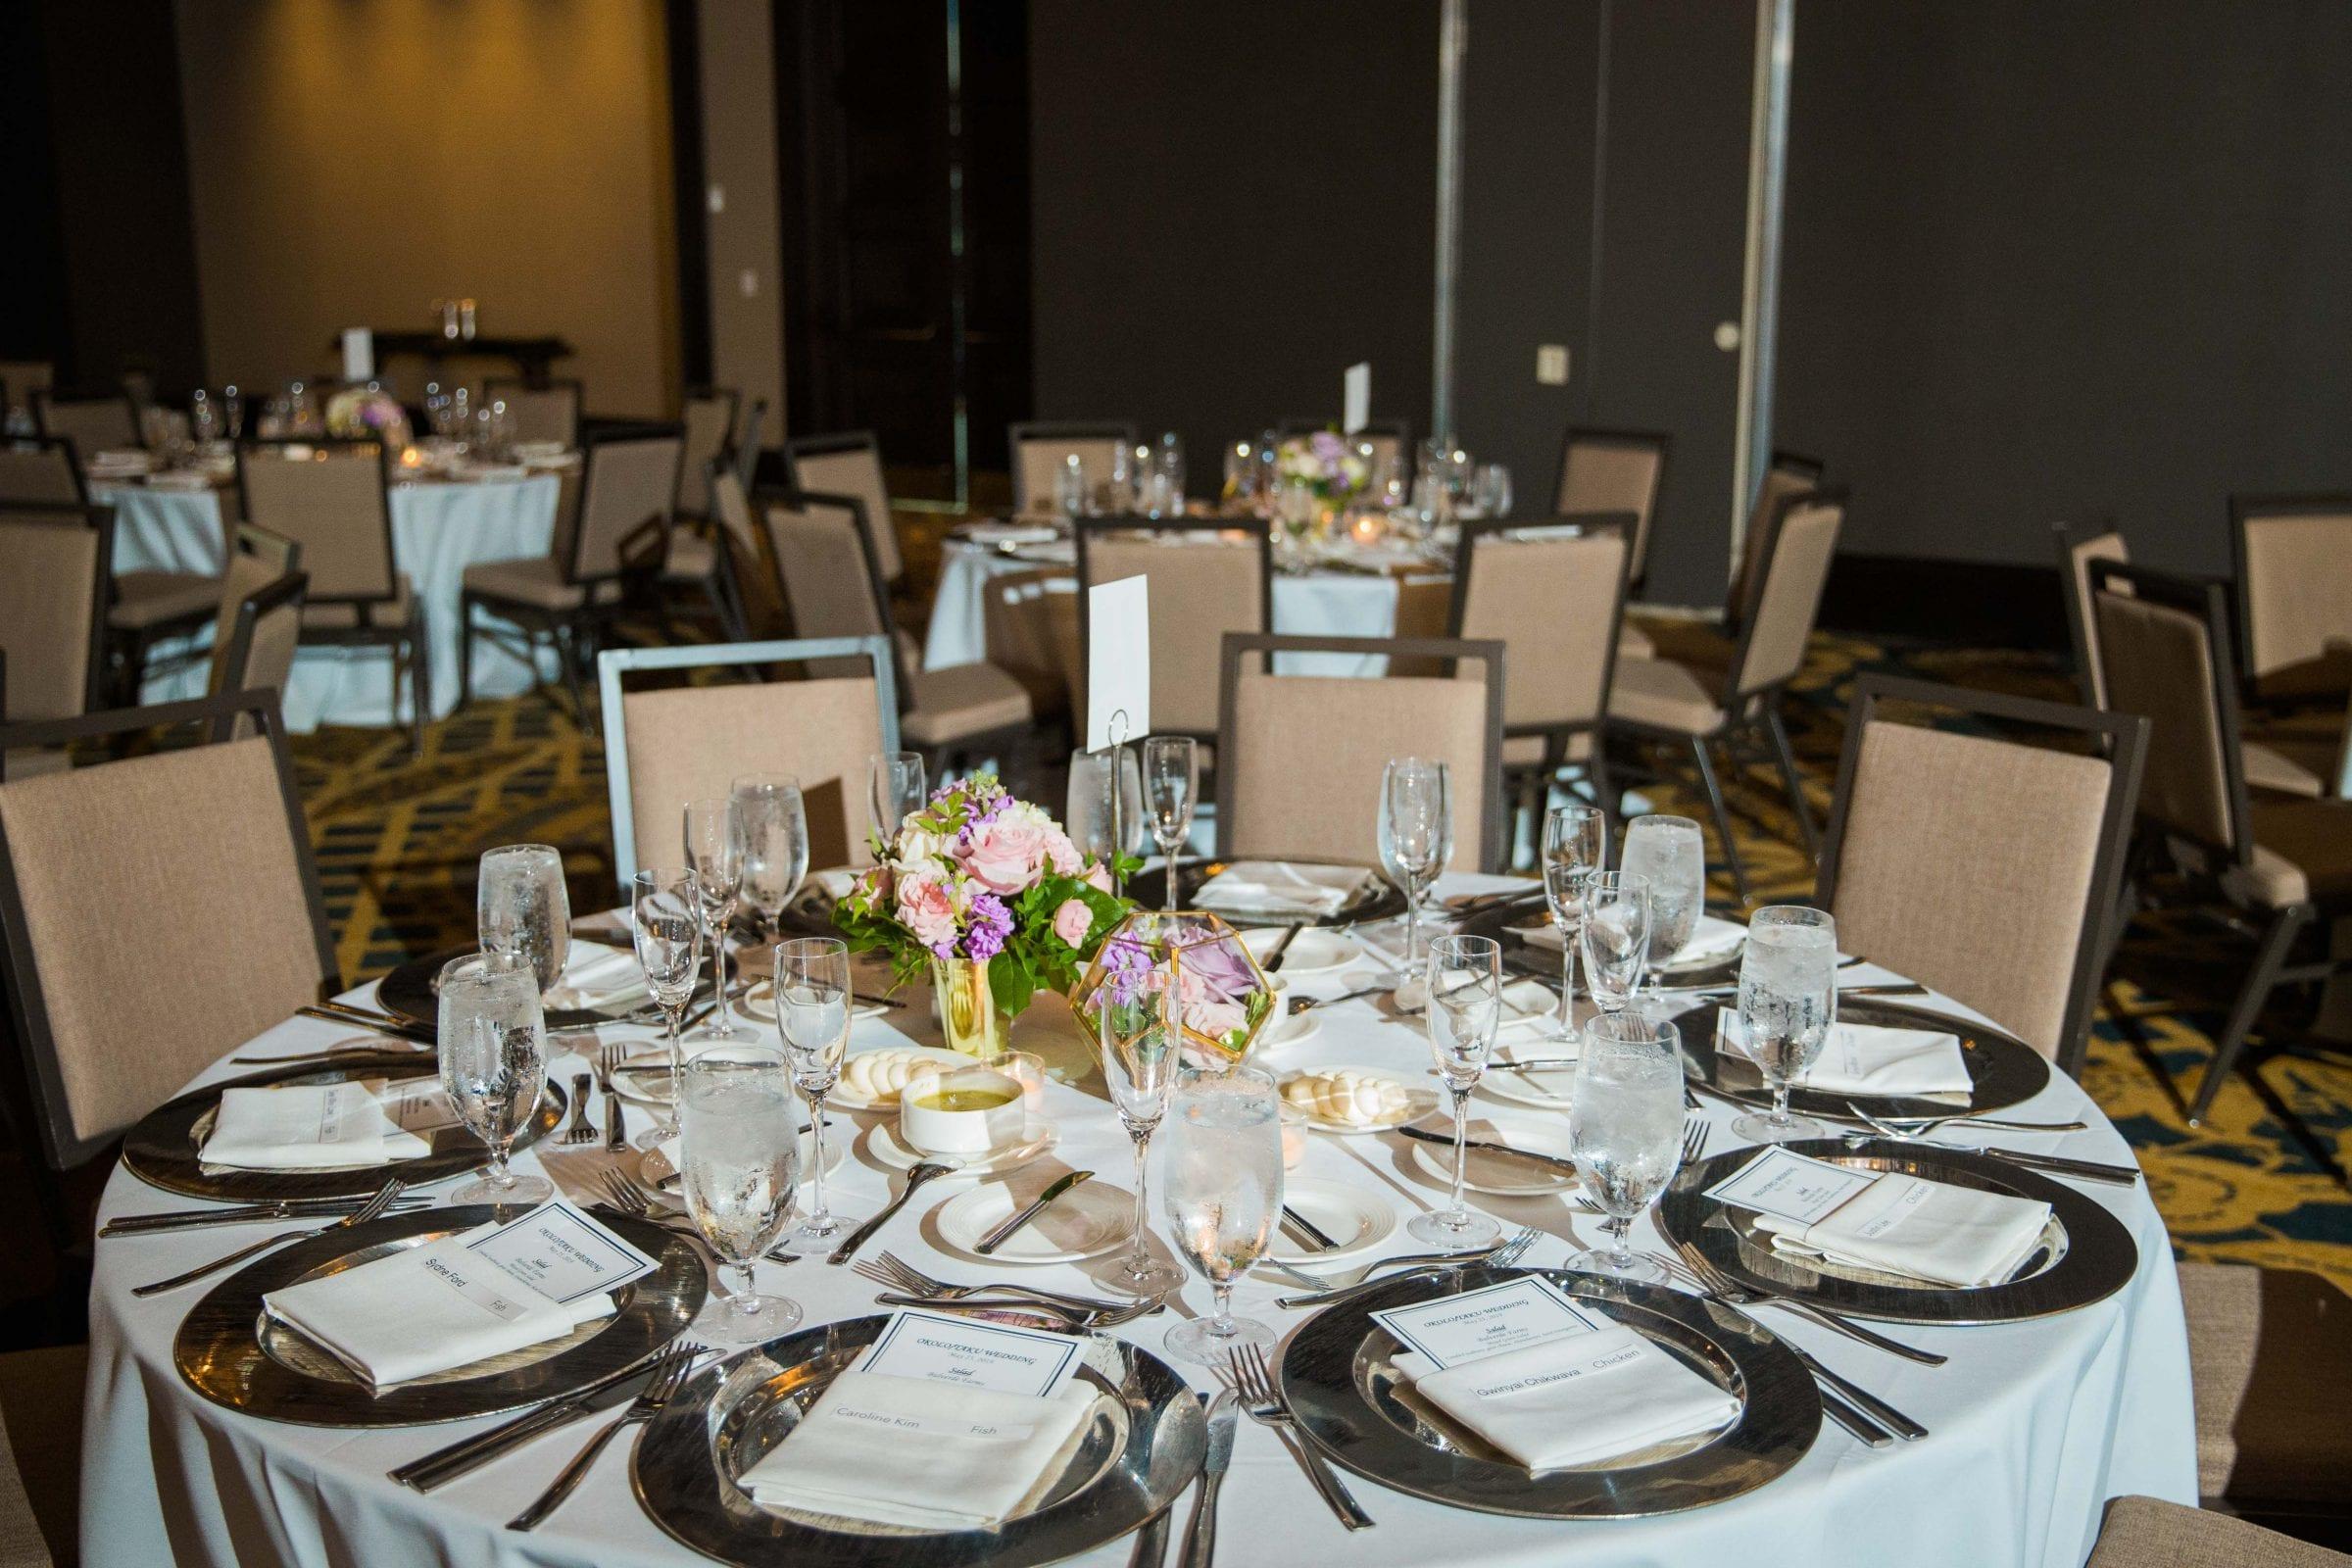 Onyema wedding La Cantera table with centerpiece